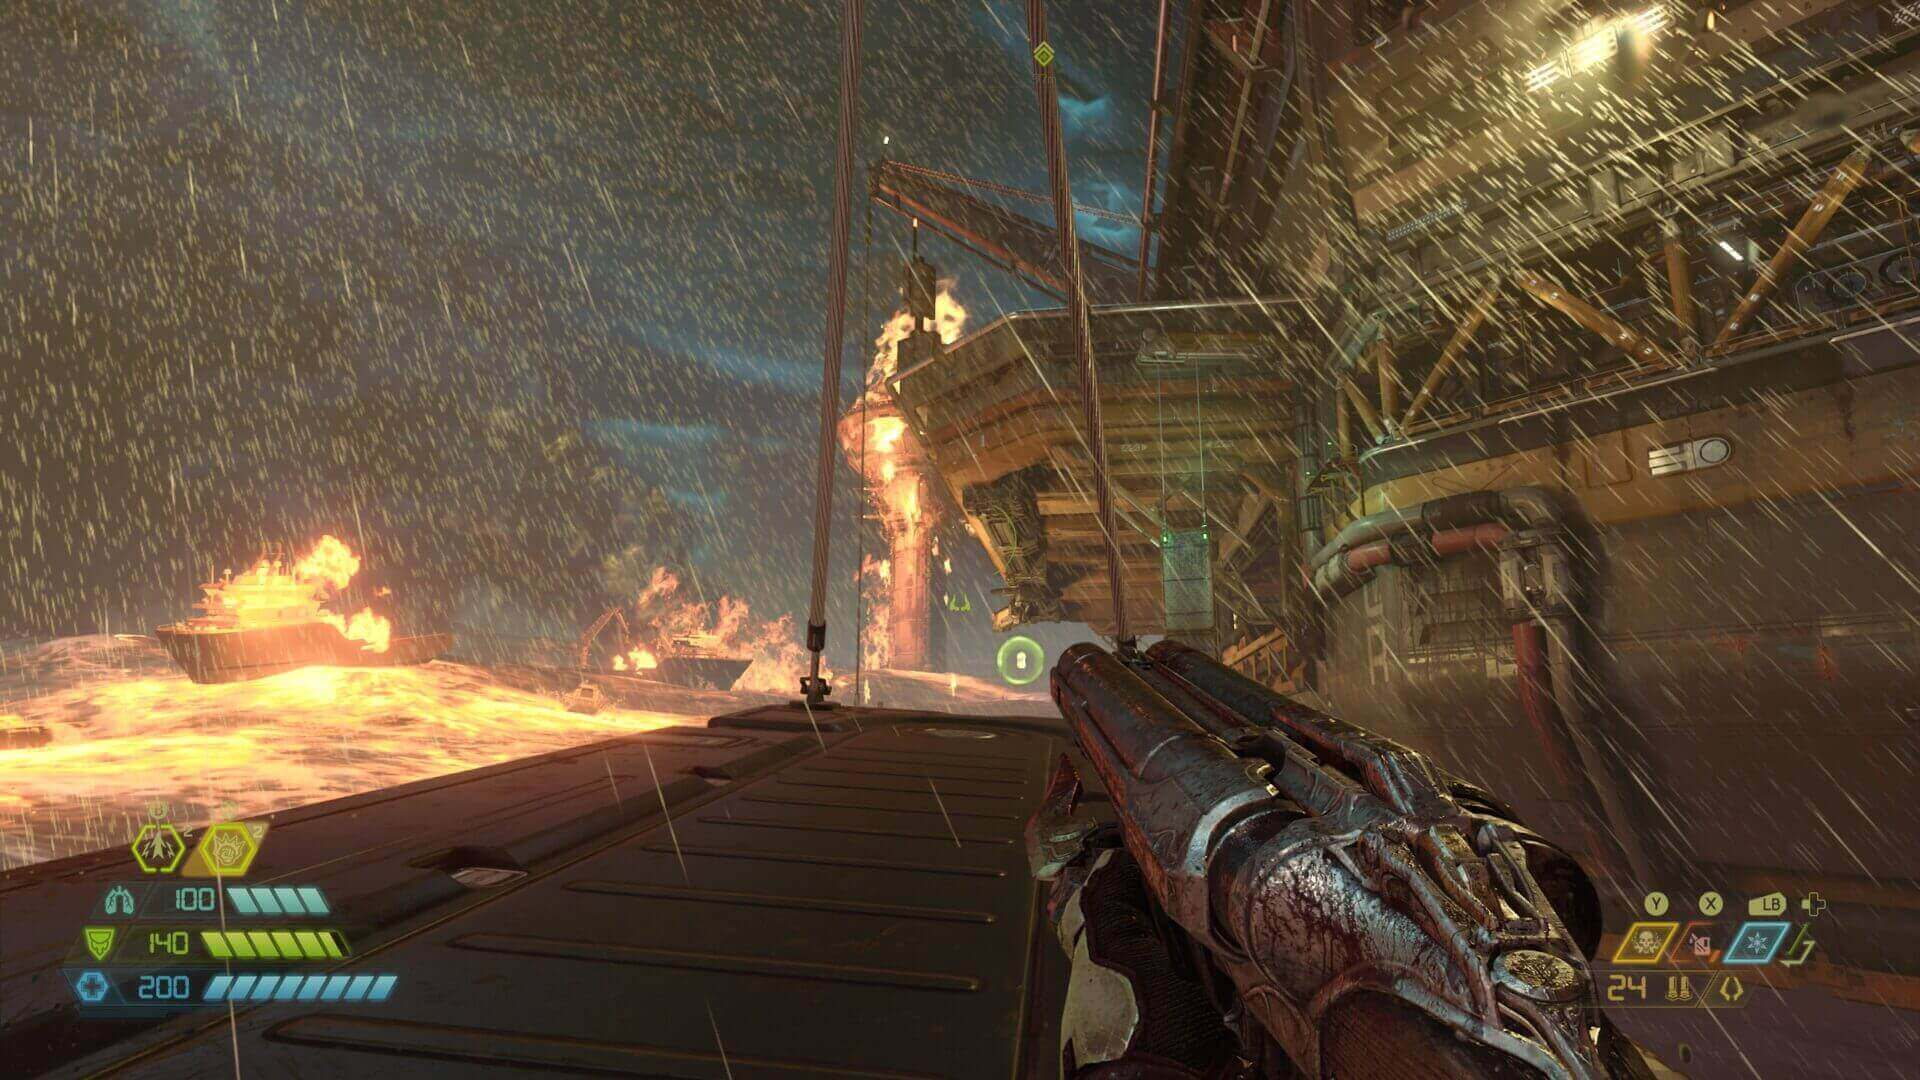 Análise Doom Eternal, Doom Eternal, Bethesda, id Software, Delfos, Análise The Ancient Gods